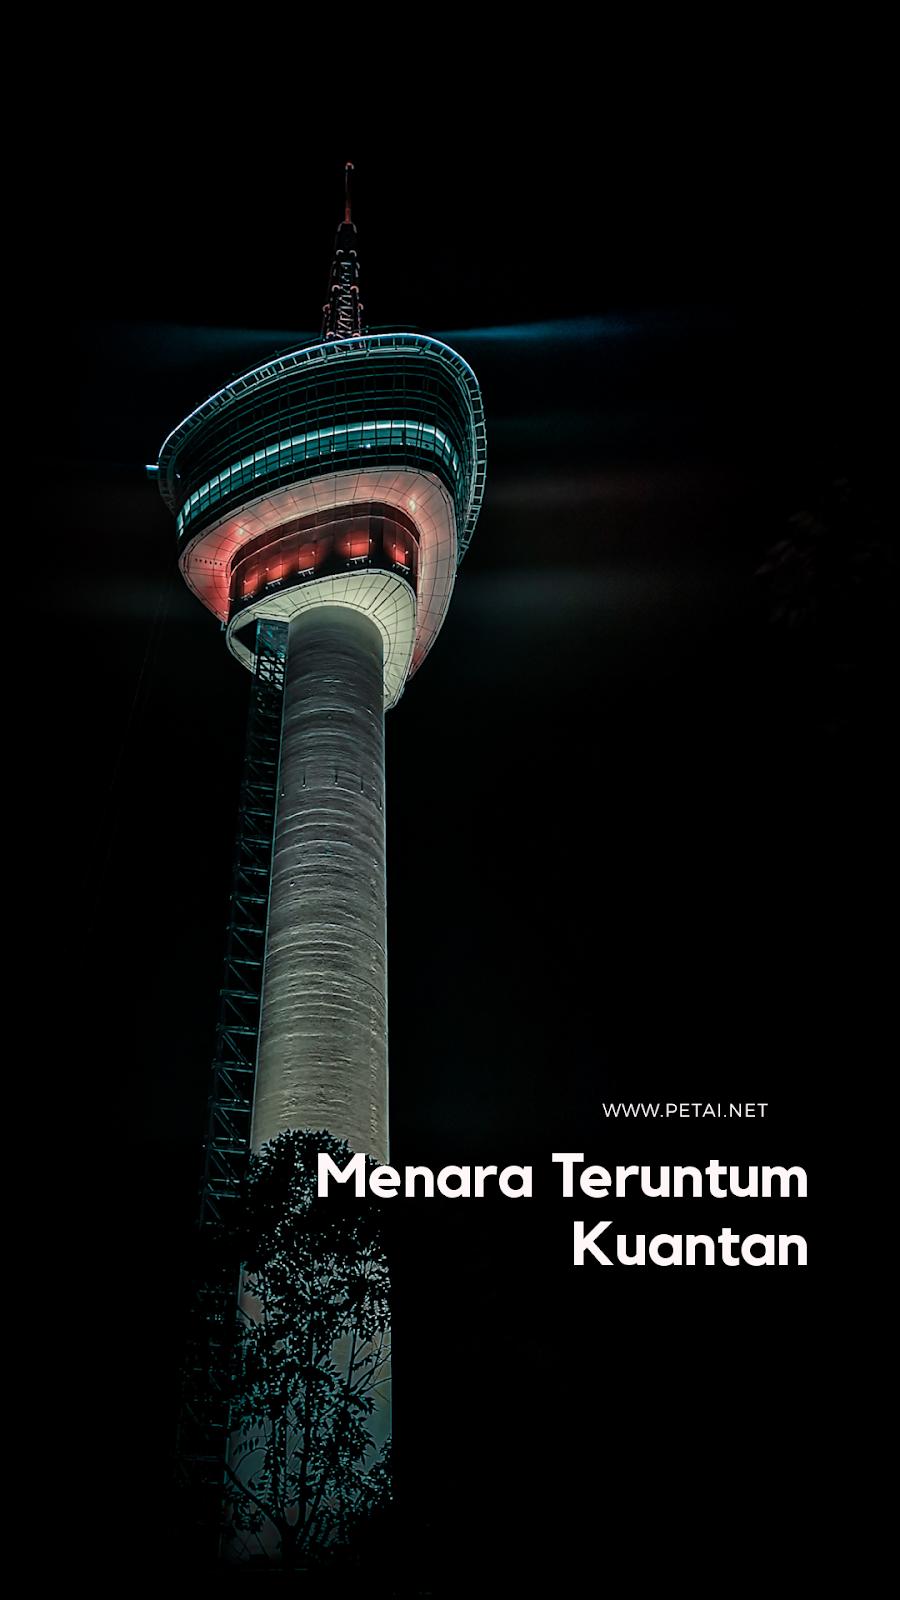 Menara Teruntum Kuantan Pahang